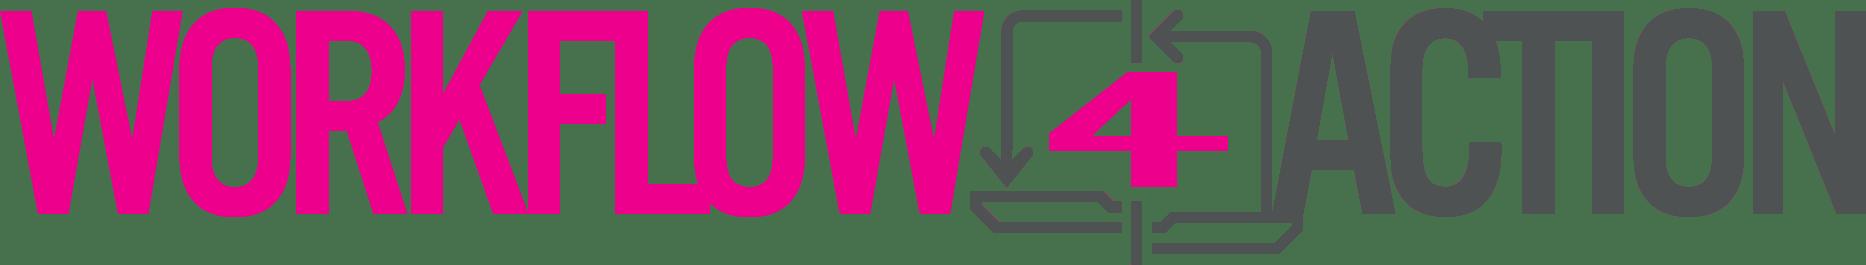 Logo horizontal de Workflow4Action